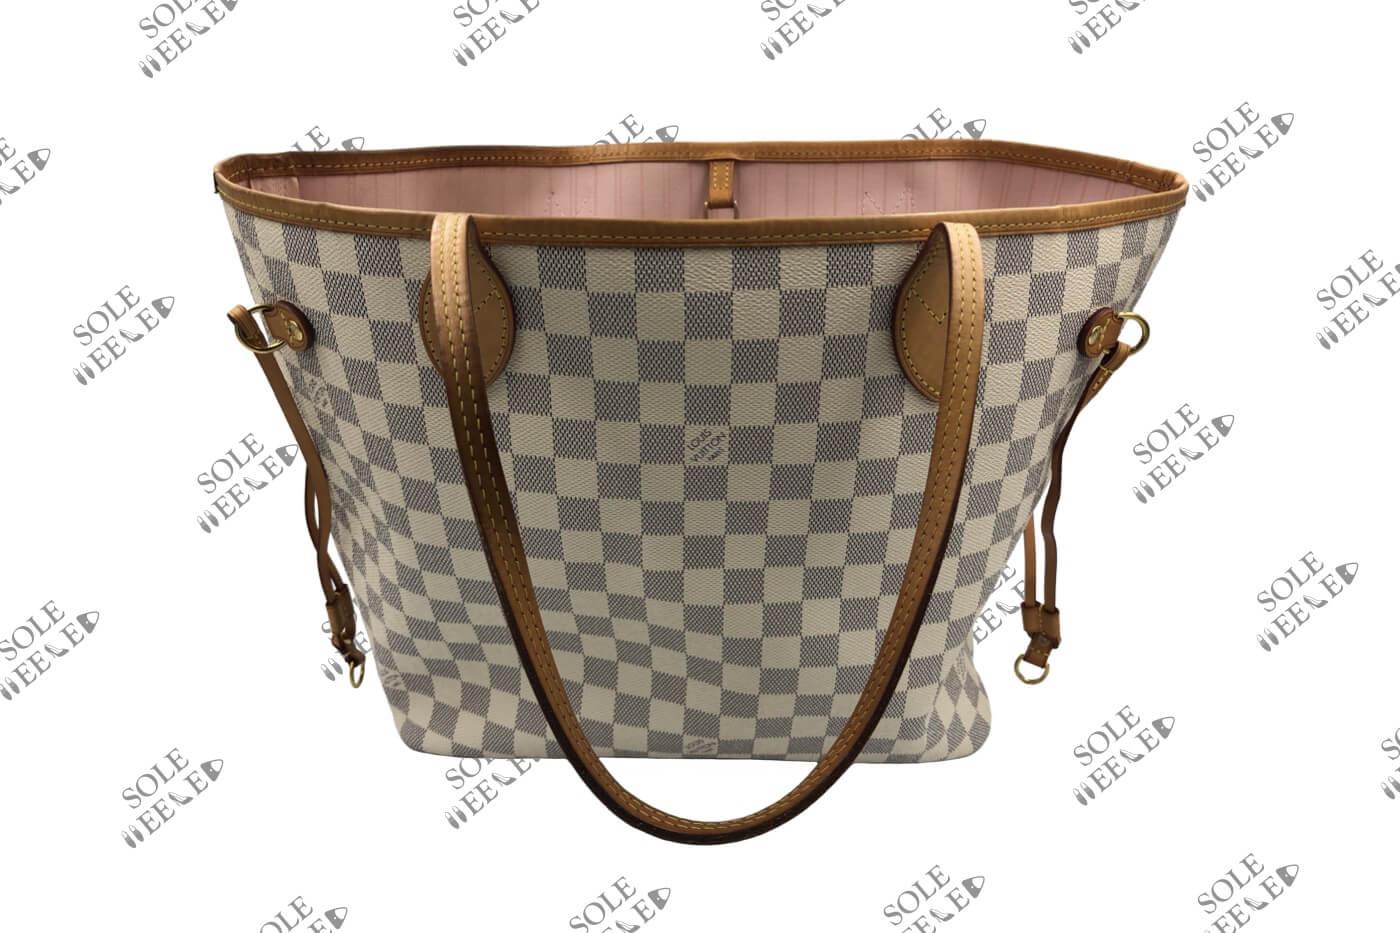 Louis Vuitton Handbag Interior Clean